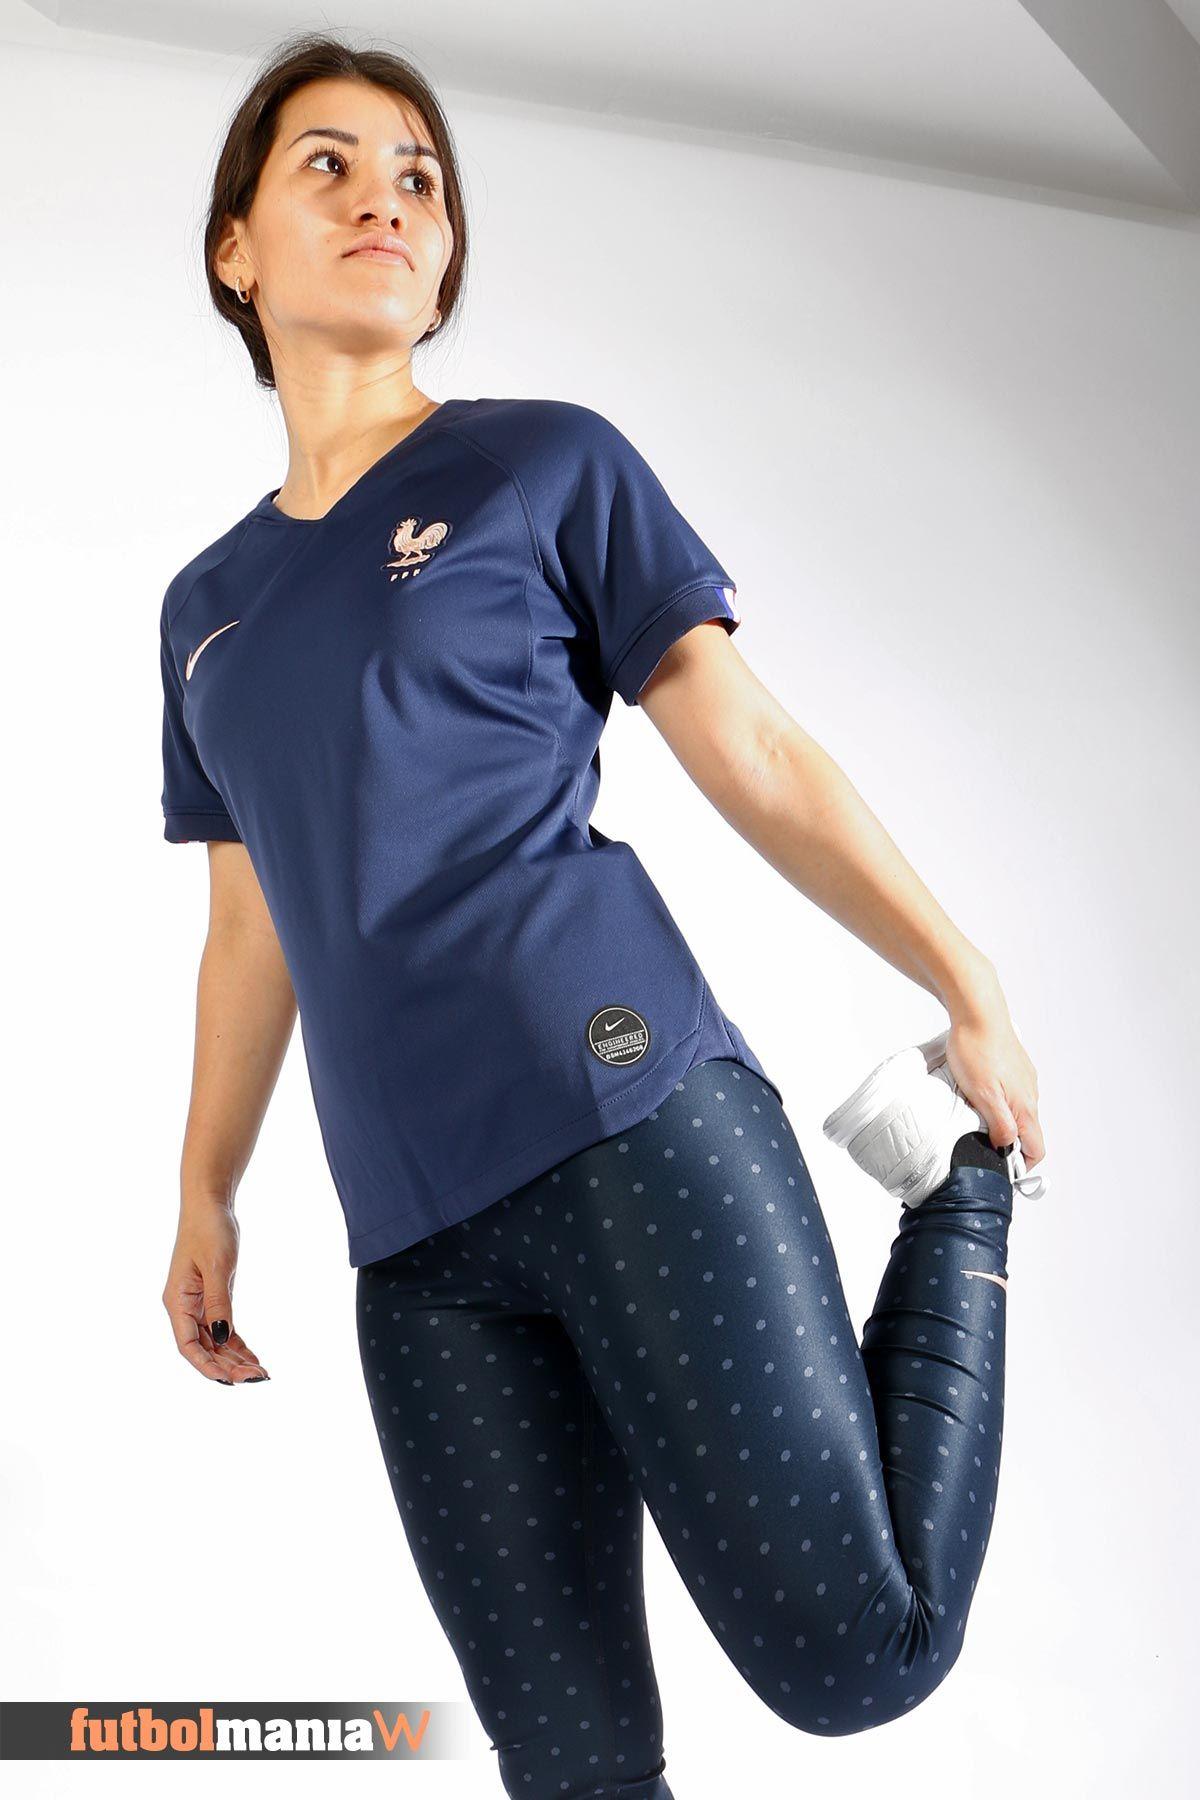 Alas suelo flor  Camiseta Nike 1a Francia Stadium mujer 2019   Mundial femenino, Mundial  femenil, Futbol femenino